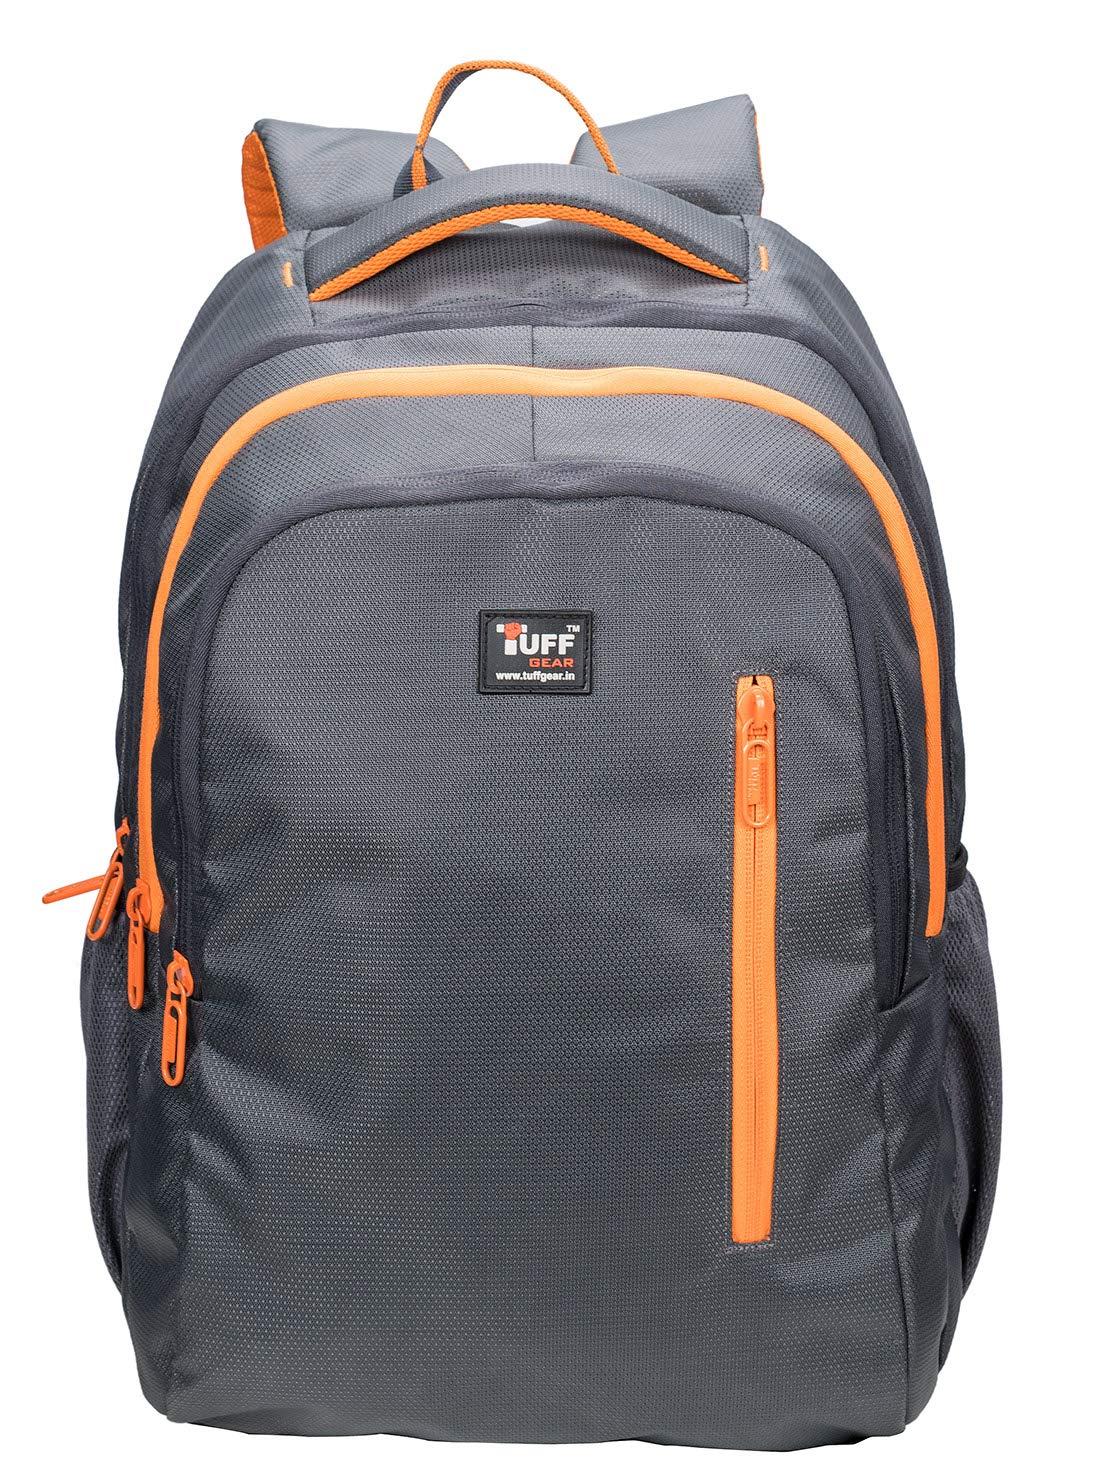 2c9f0ba394 Tuff Gear Denmark 23 L Polyester College Bag (Grey): Amazon.in: Bags,  Wallets & Luggage